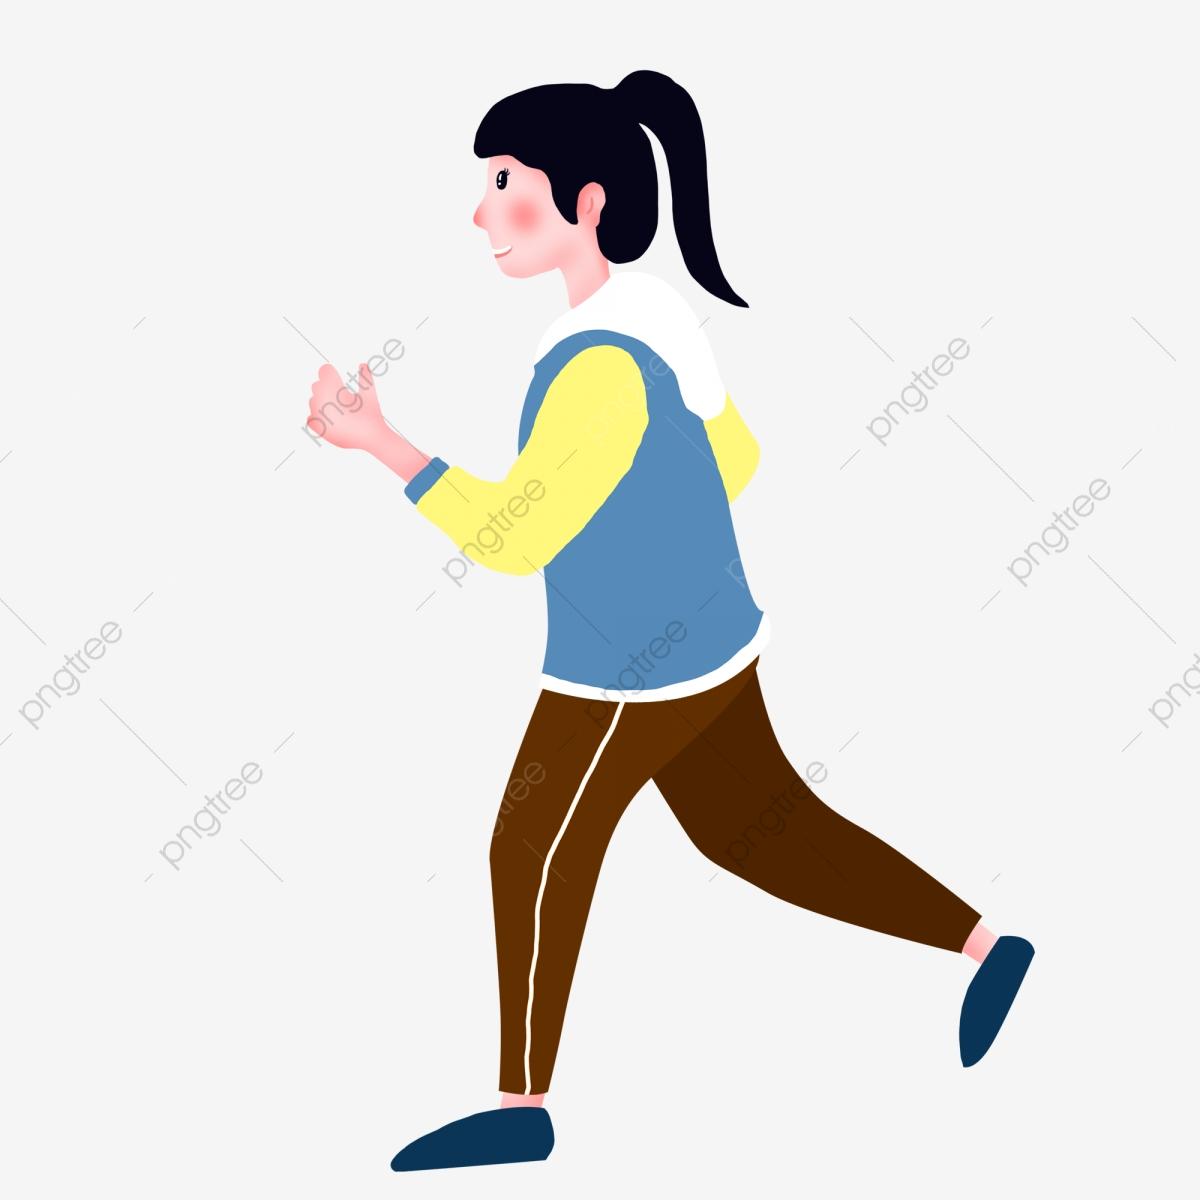 Exercising clipart student exercise. Female doing morning exercises